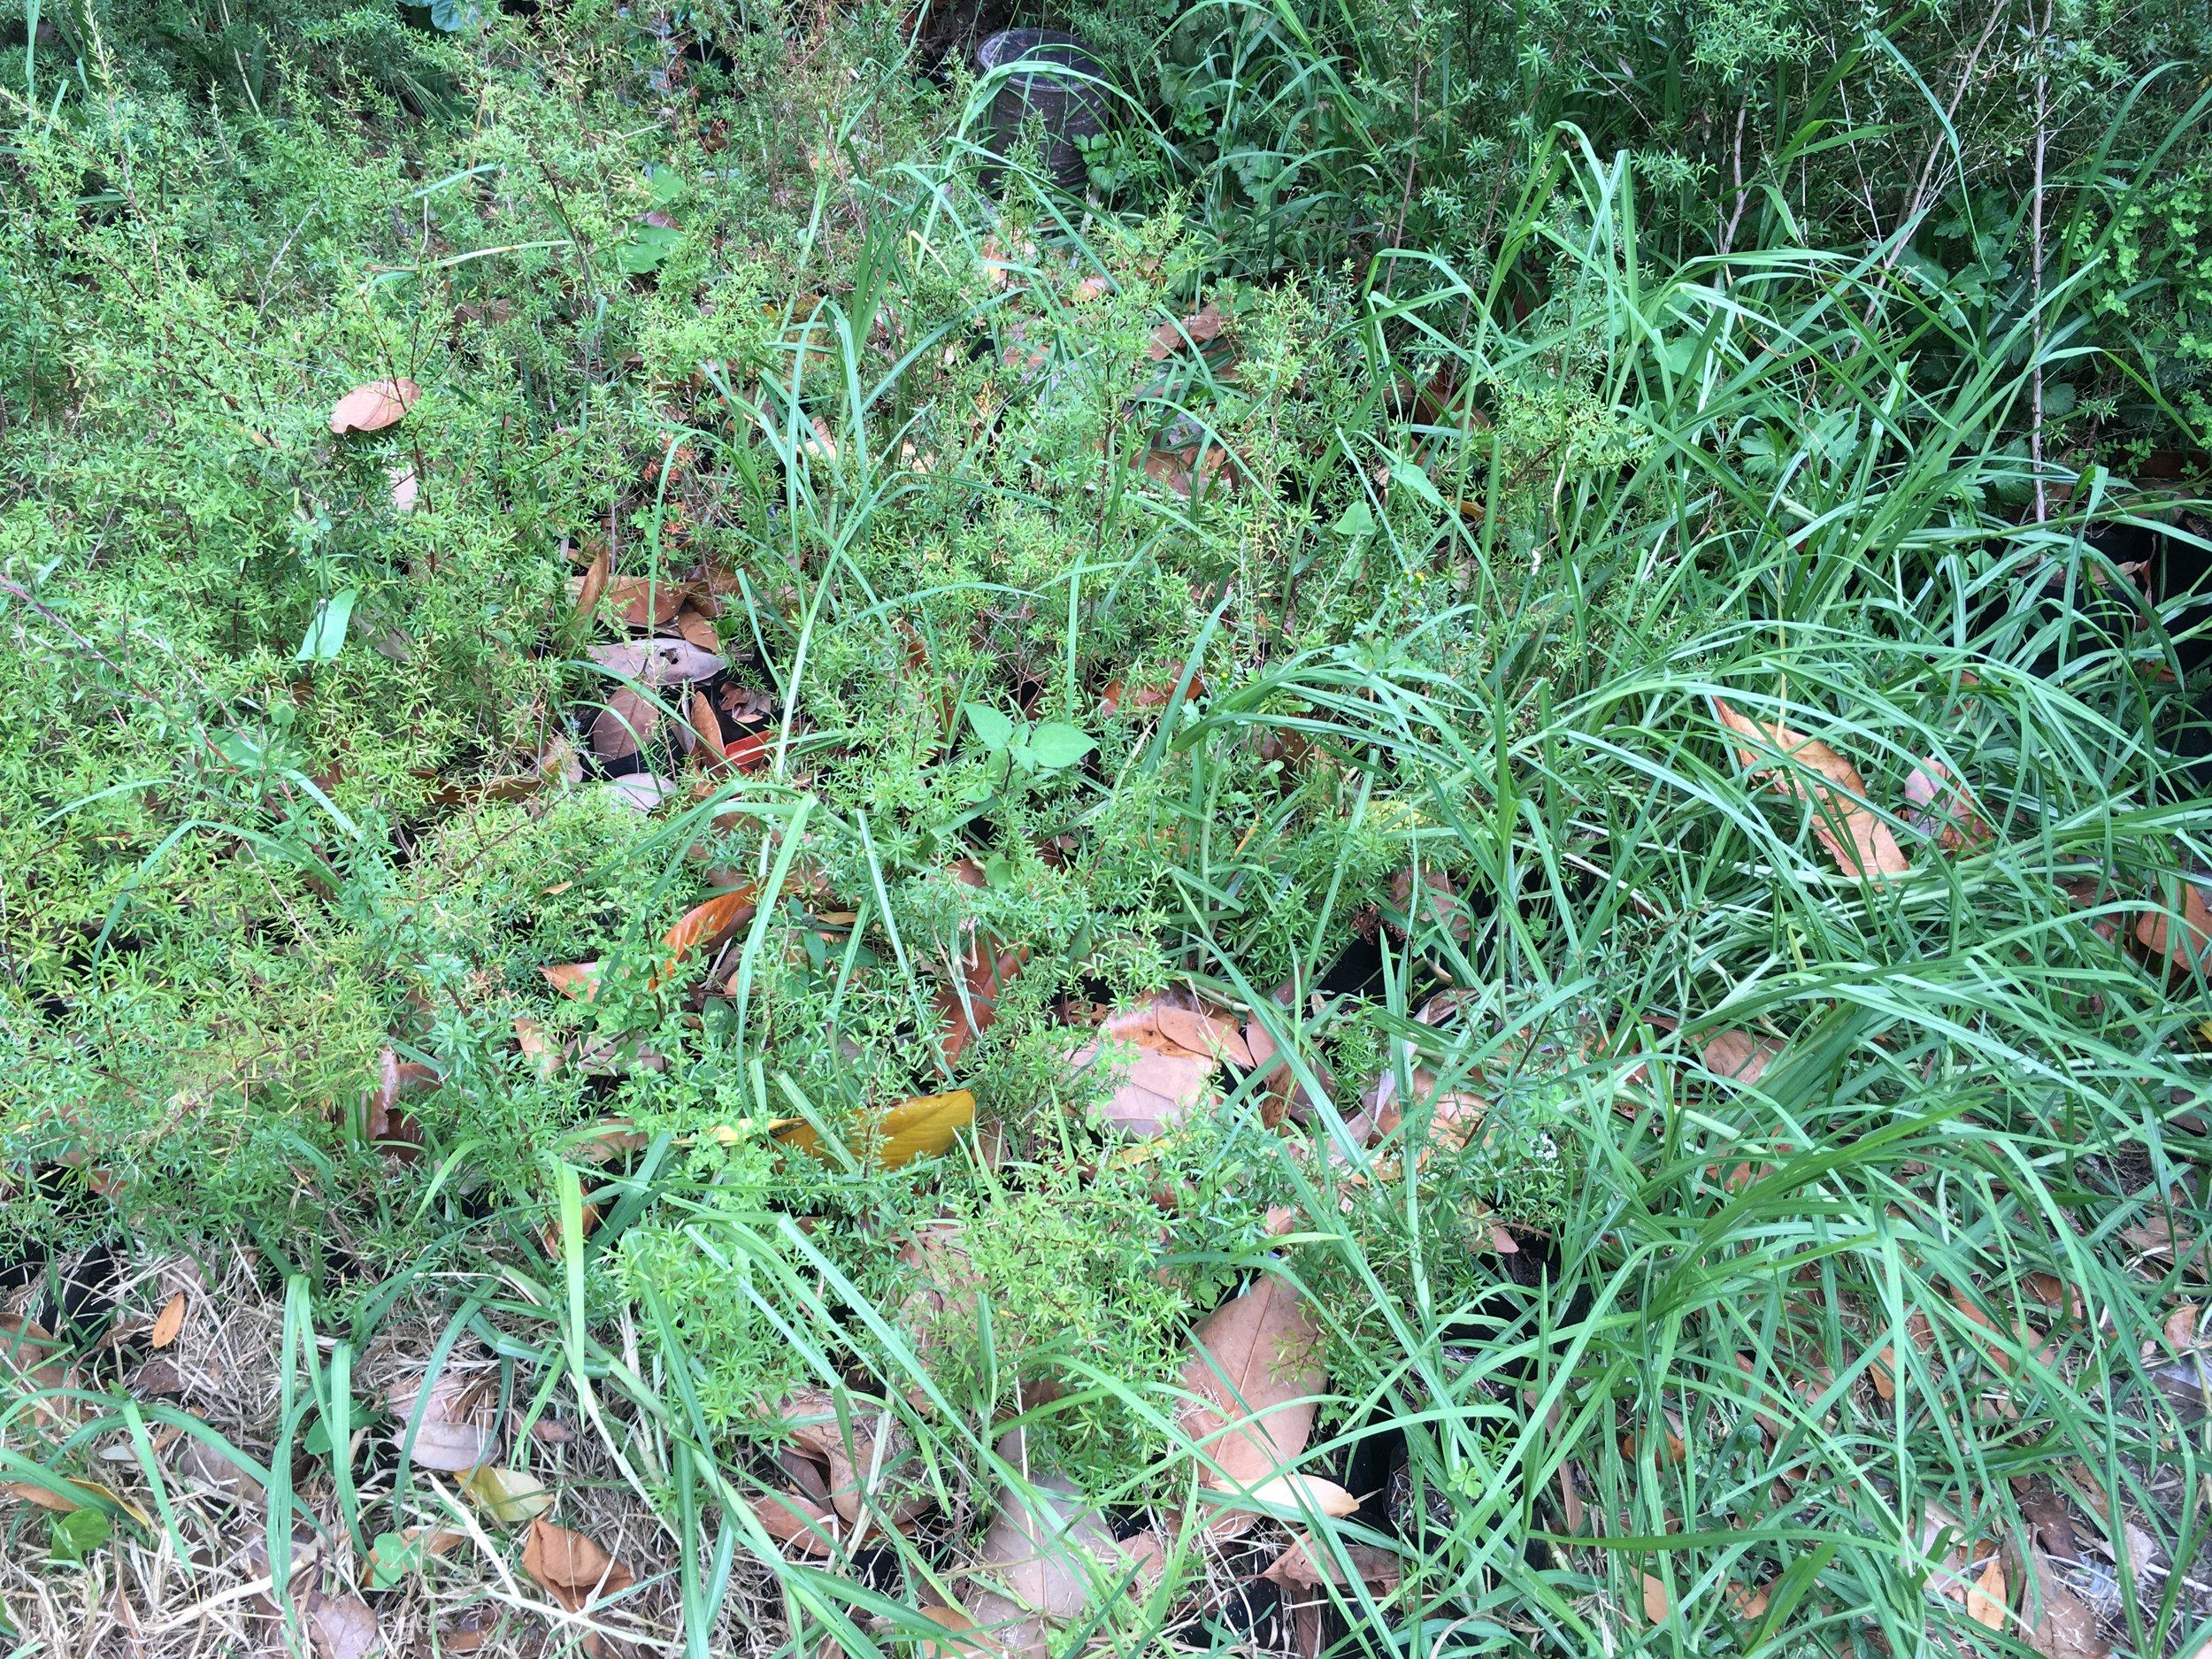 Manuka seedlings overgrown with grasses